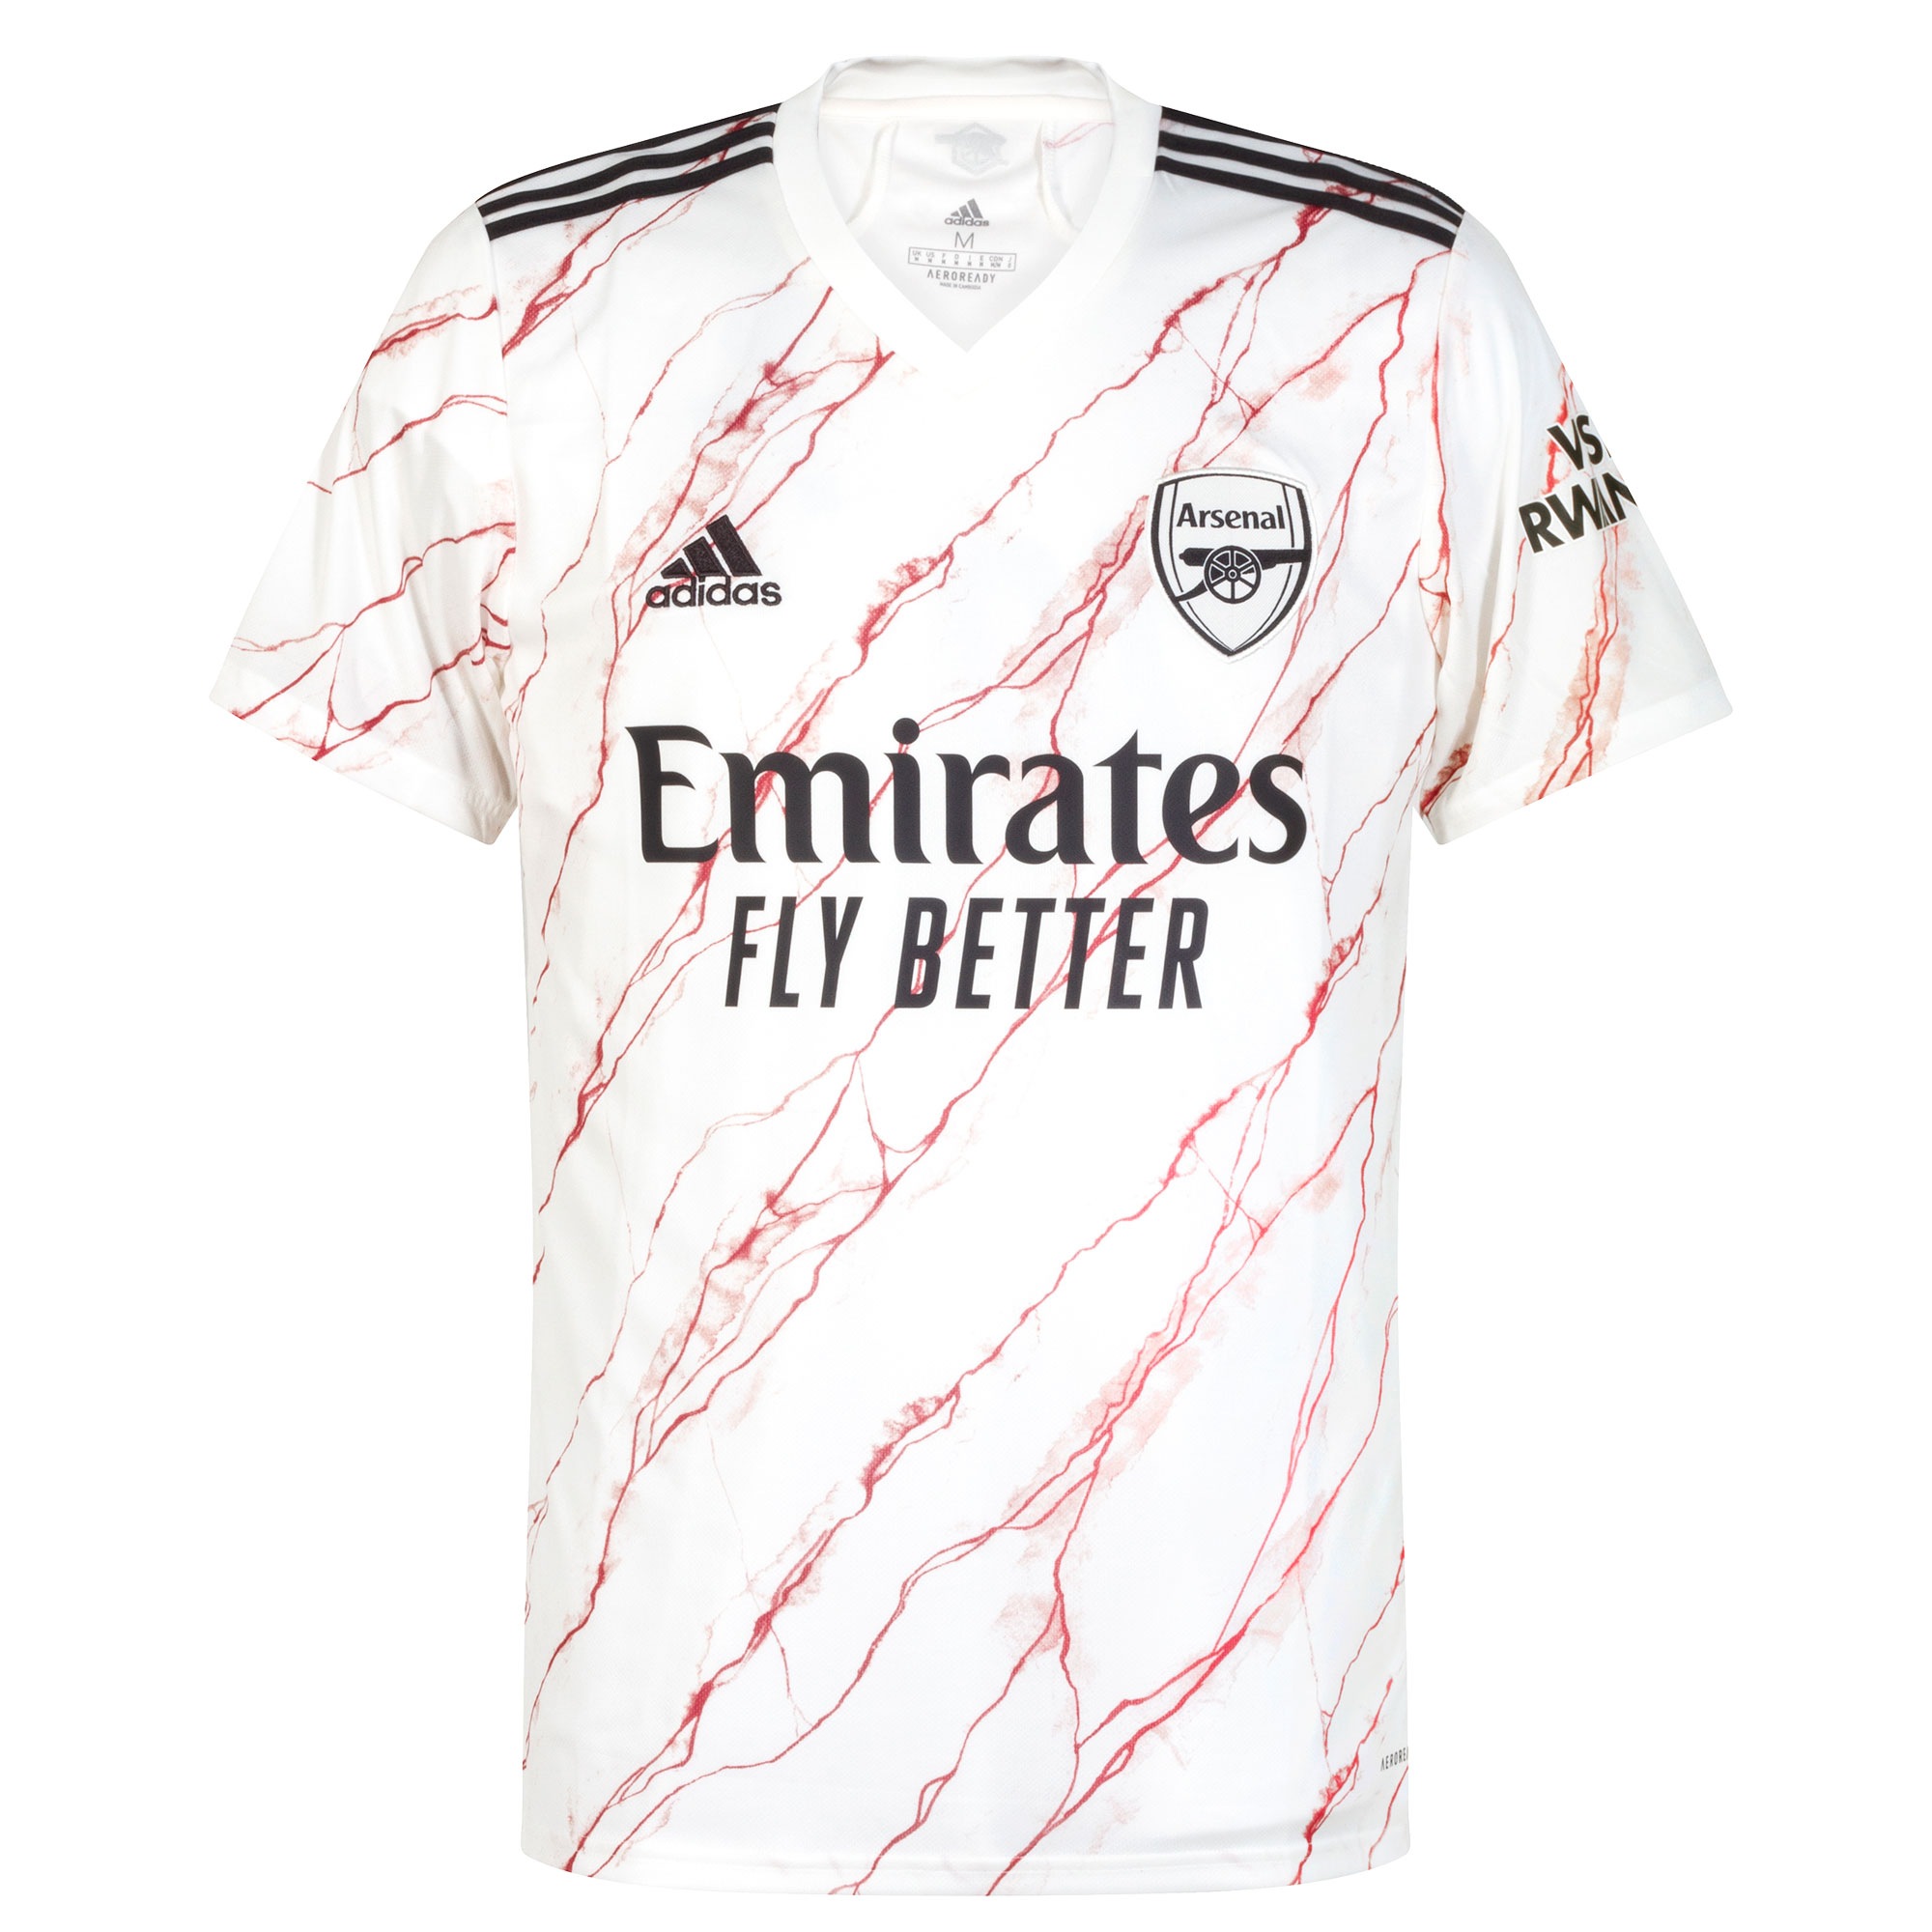 Arsenal Borta tröja